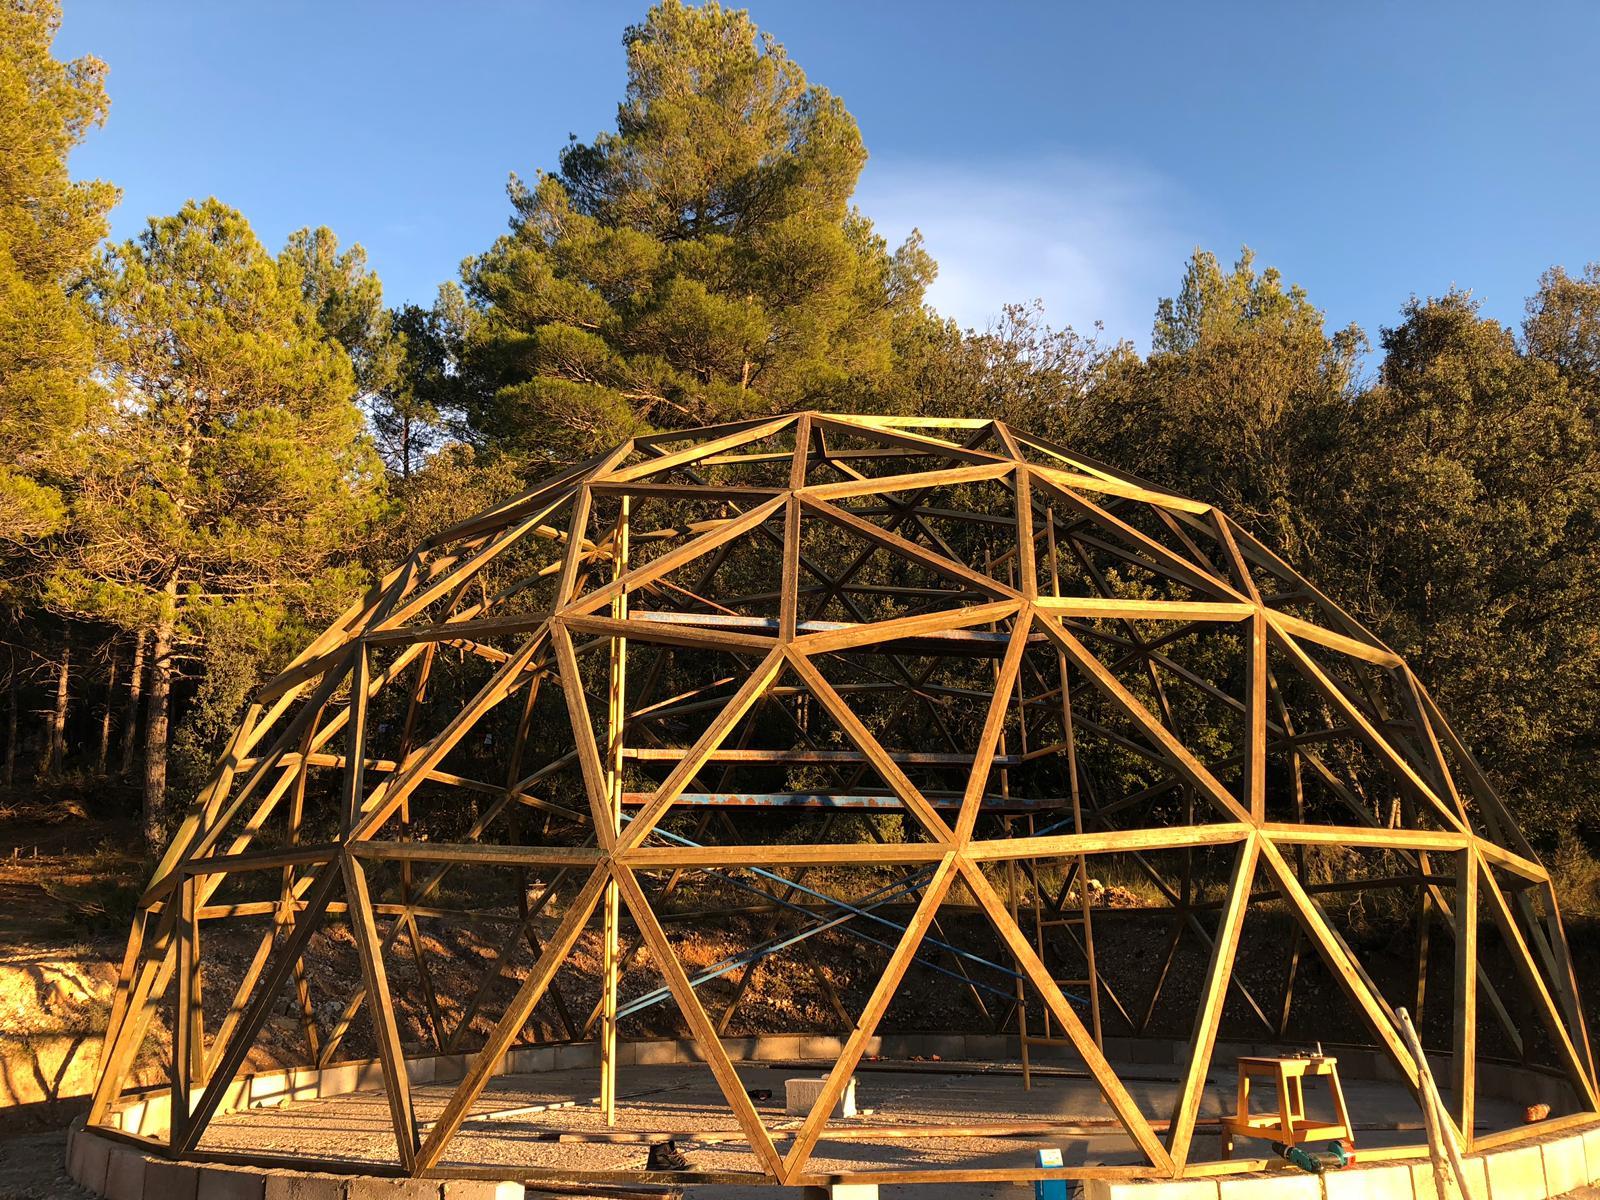 La cúpula casi terminada